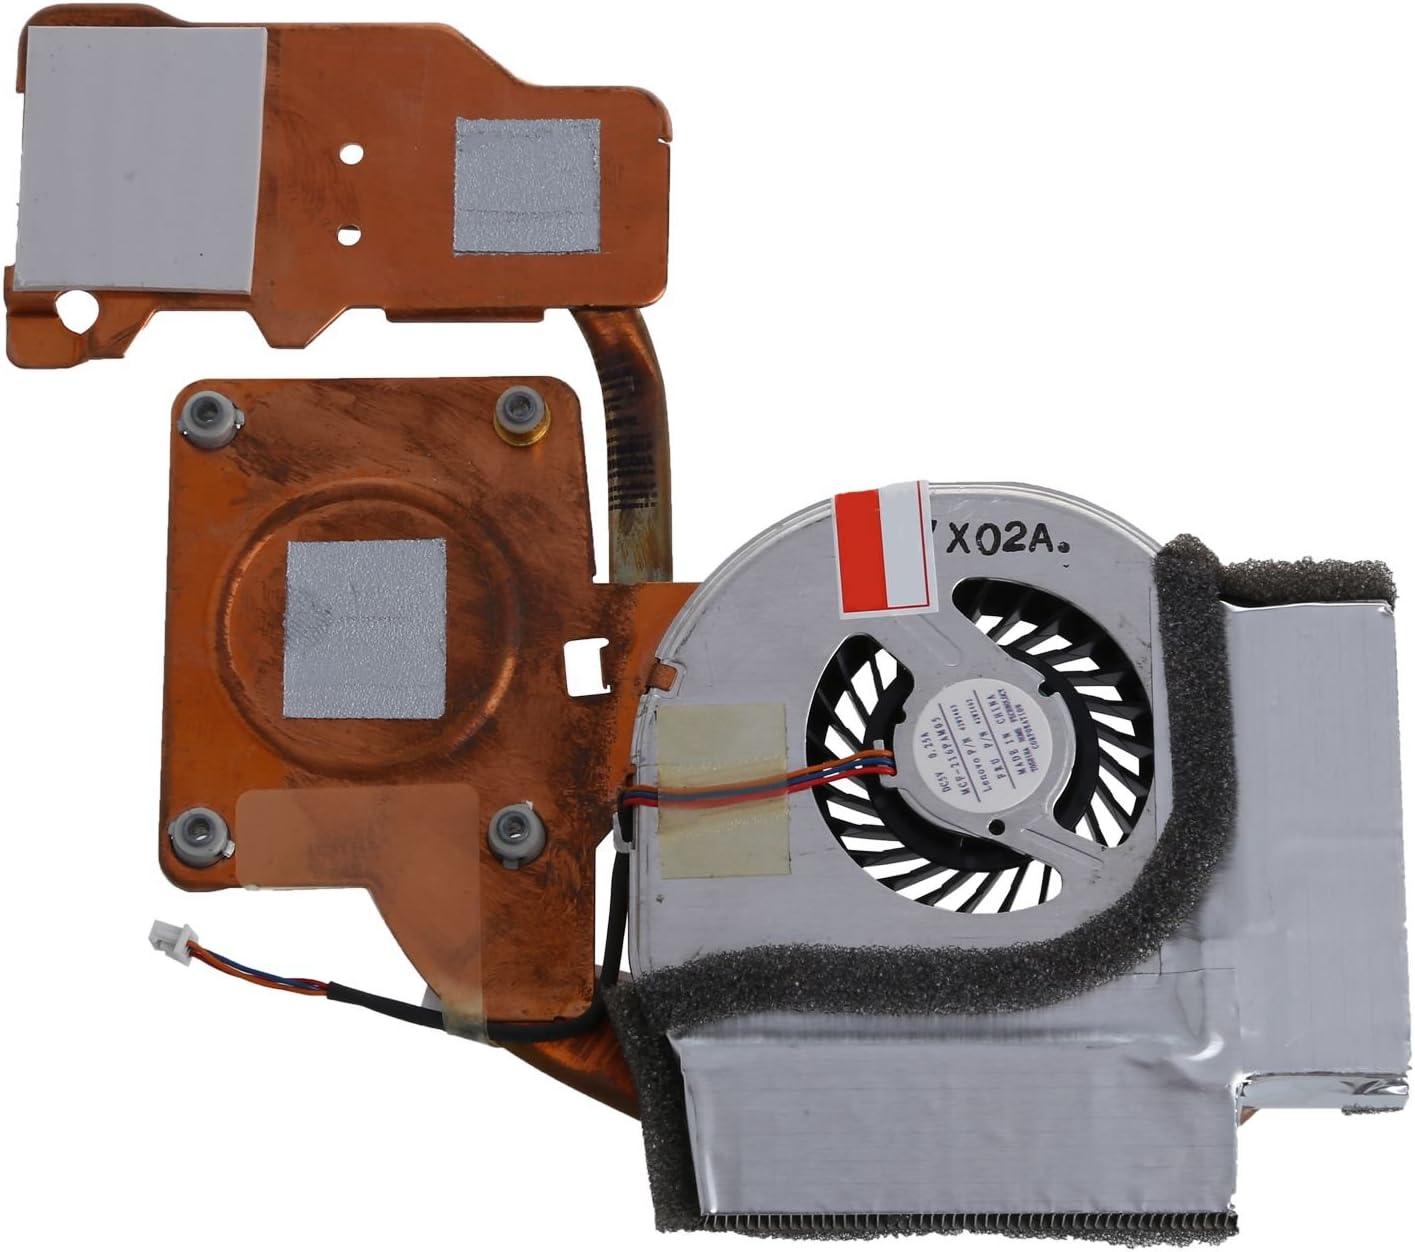 Vaorwne CPU Fan Cooler Heatsink CPU Cooler for ThinkPad T61 T61p